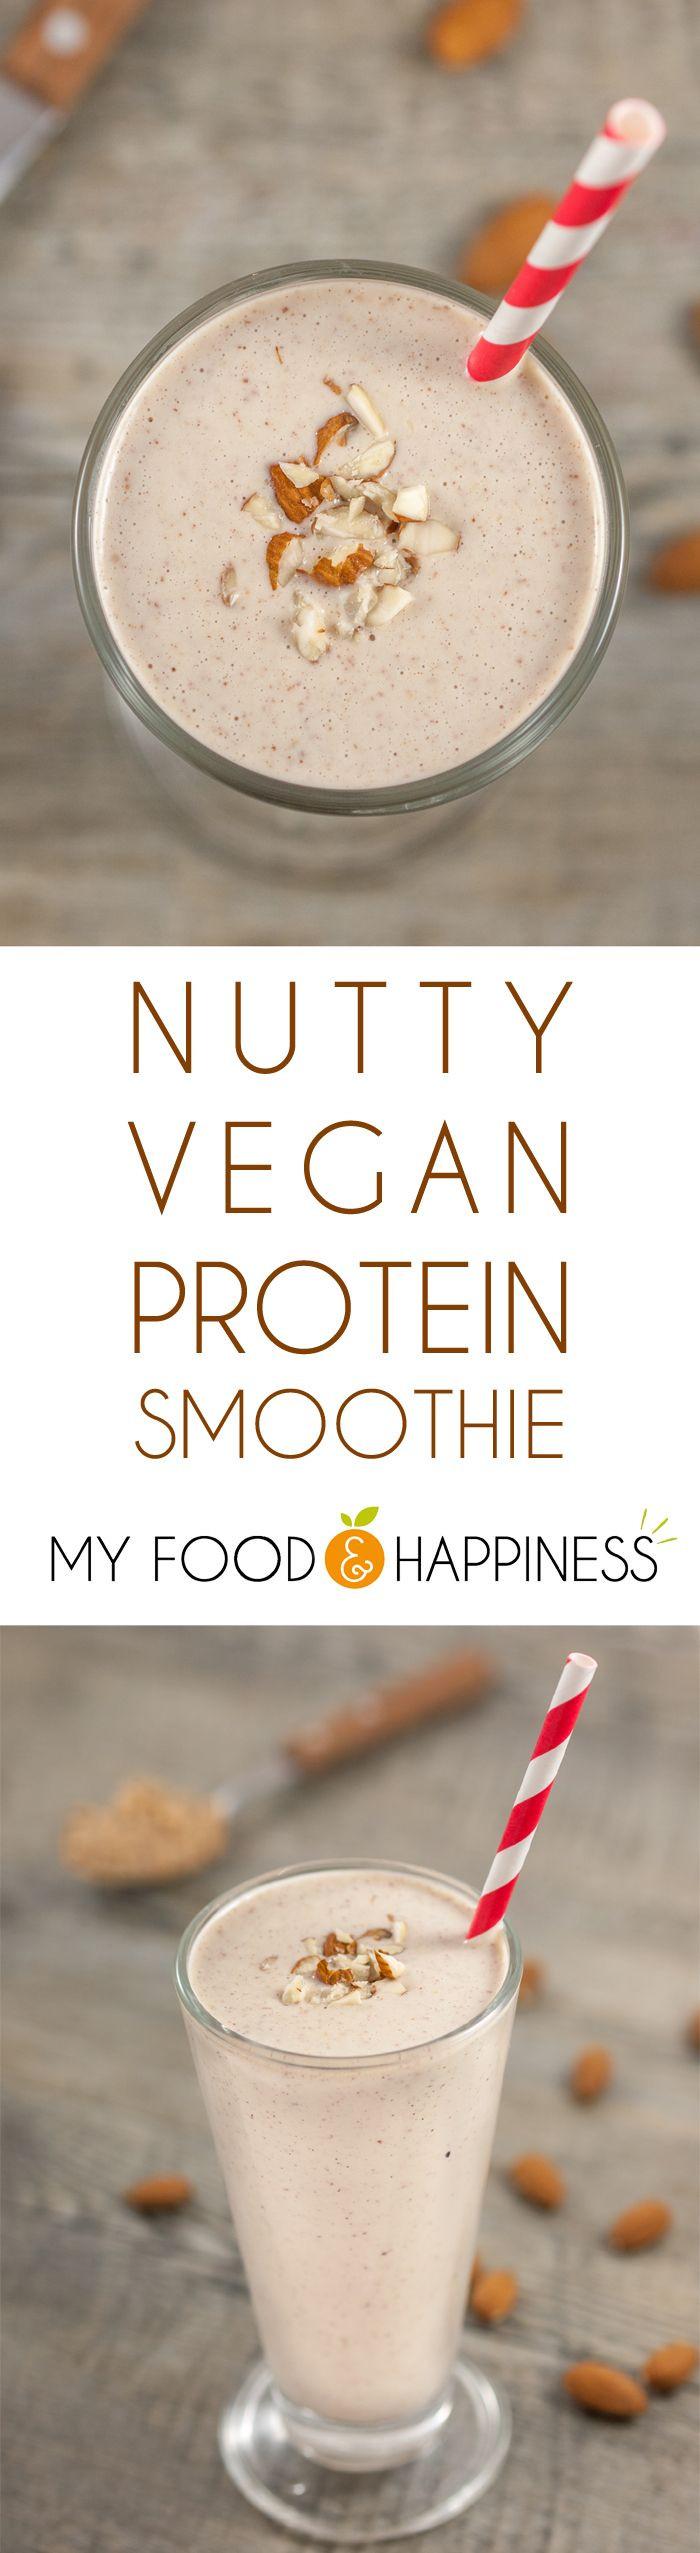 Vegan Protein Smoothie Recipes  Nutty vegan protein smoothie Recipe